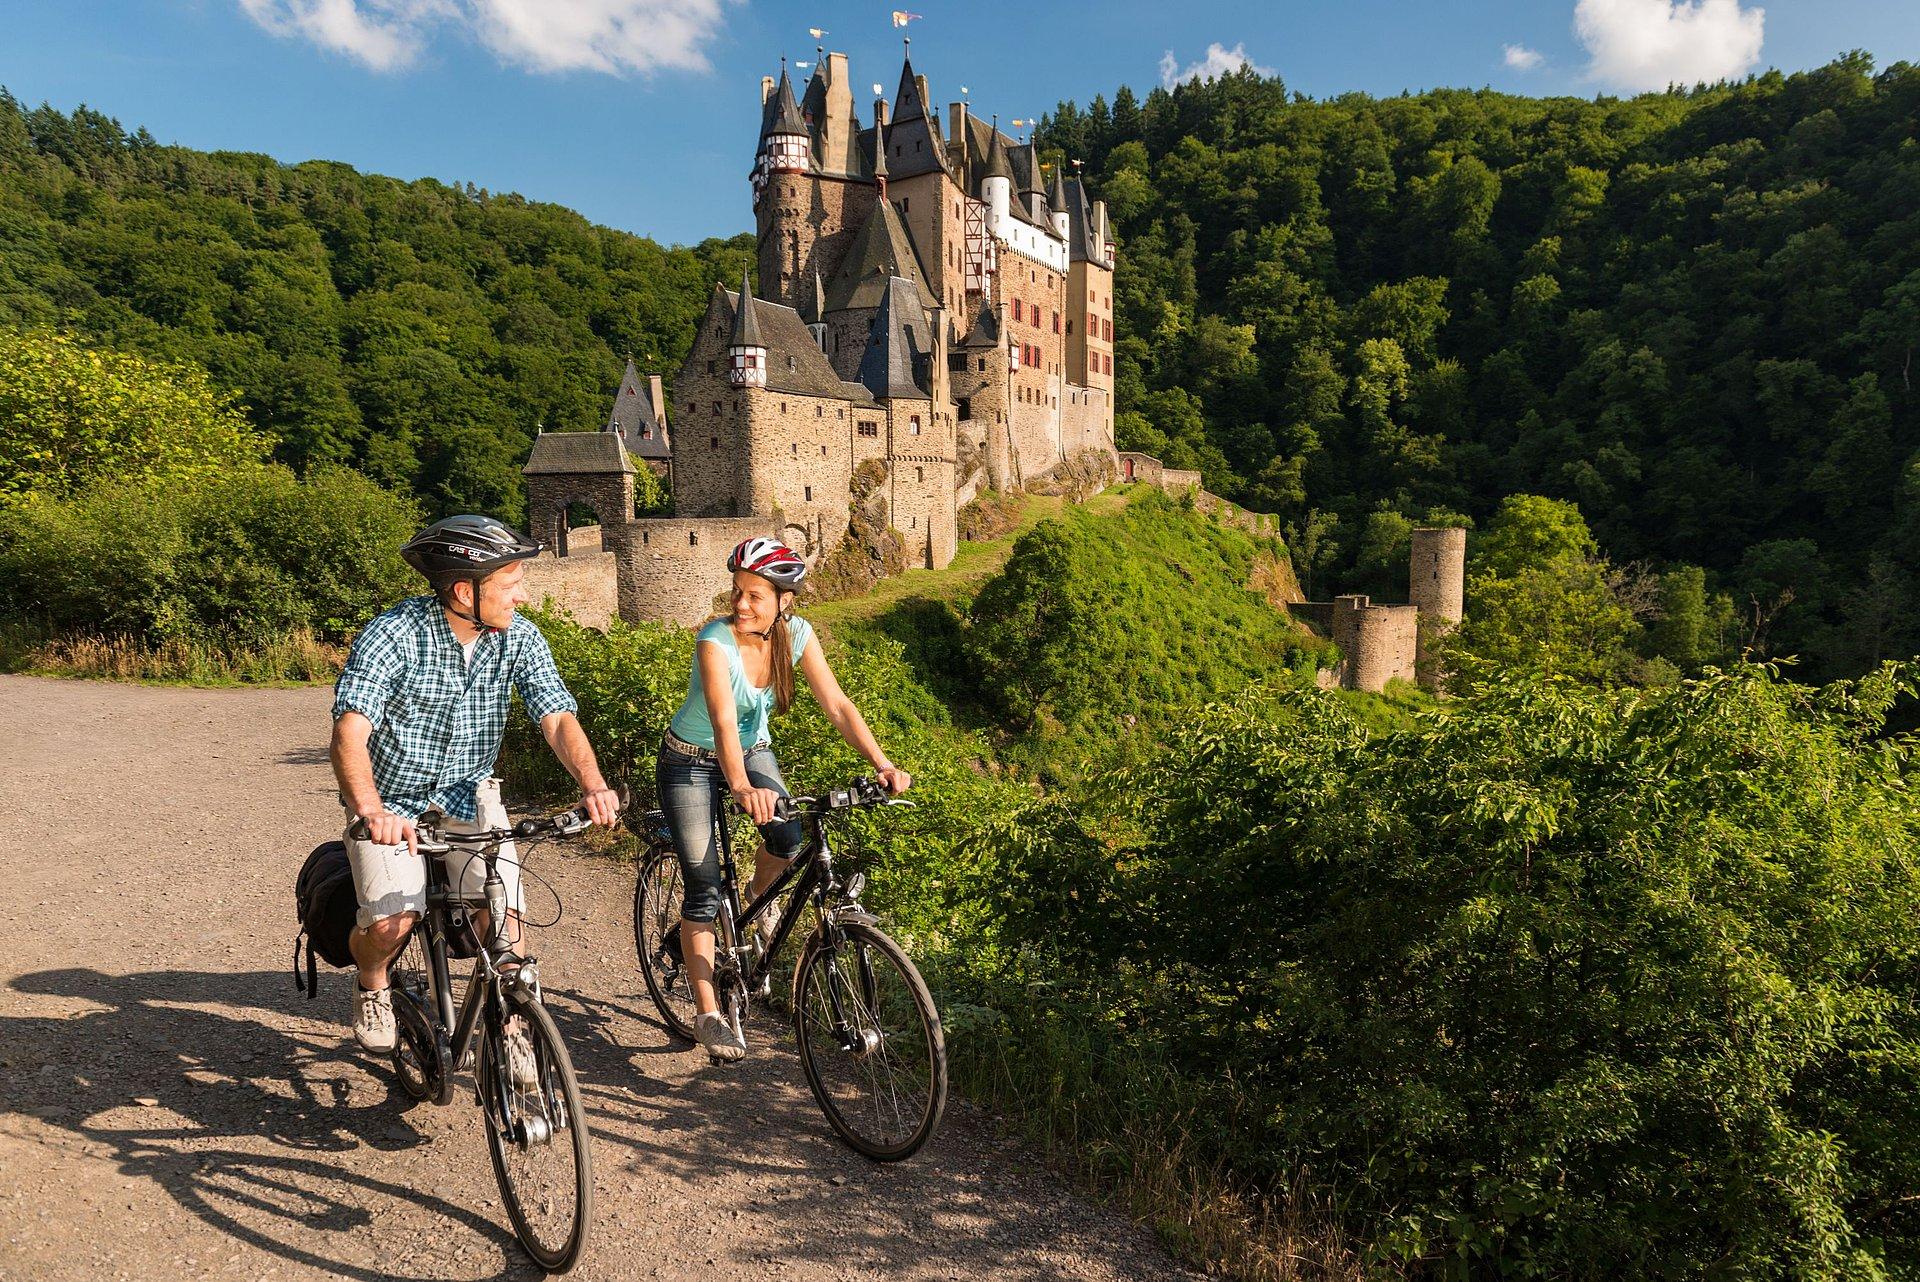 Über den Maifeld-Radweg zur Burg Eltz, Eifel